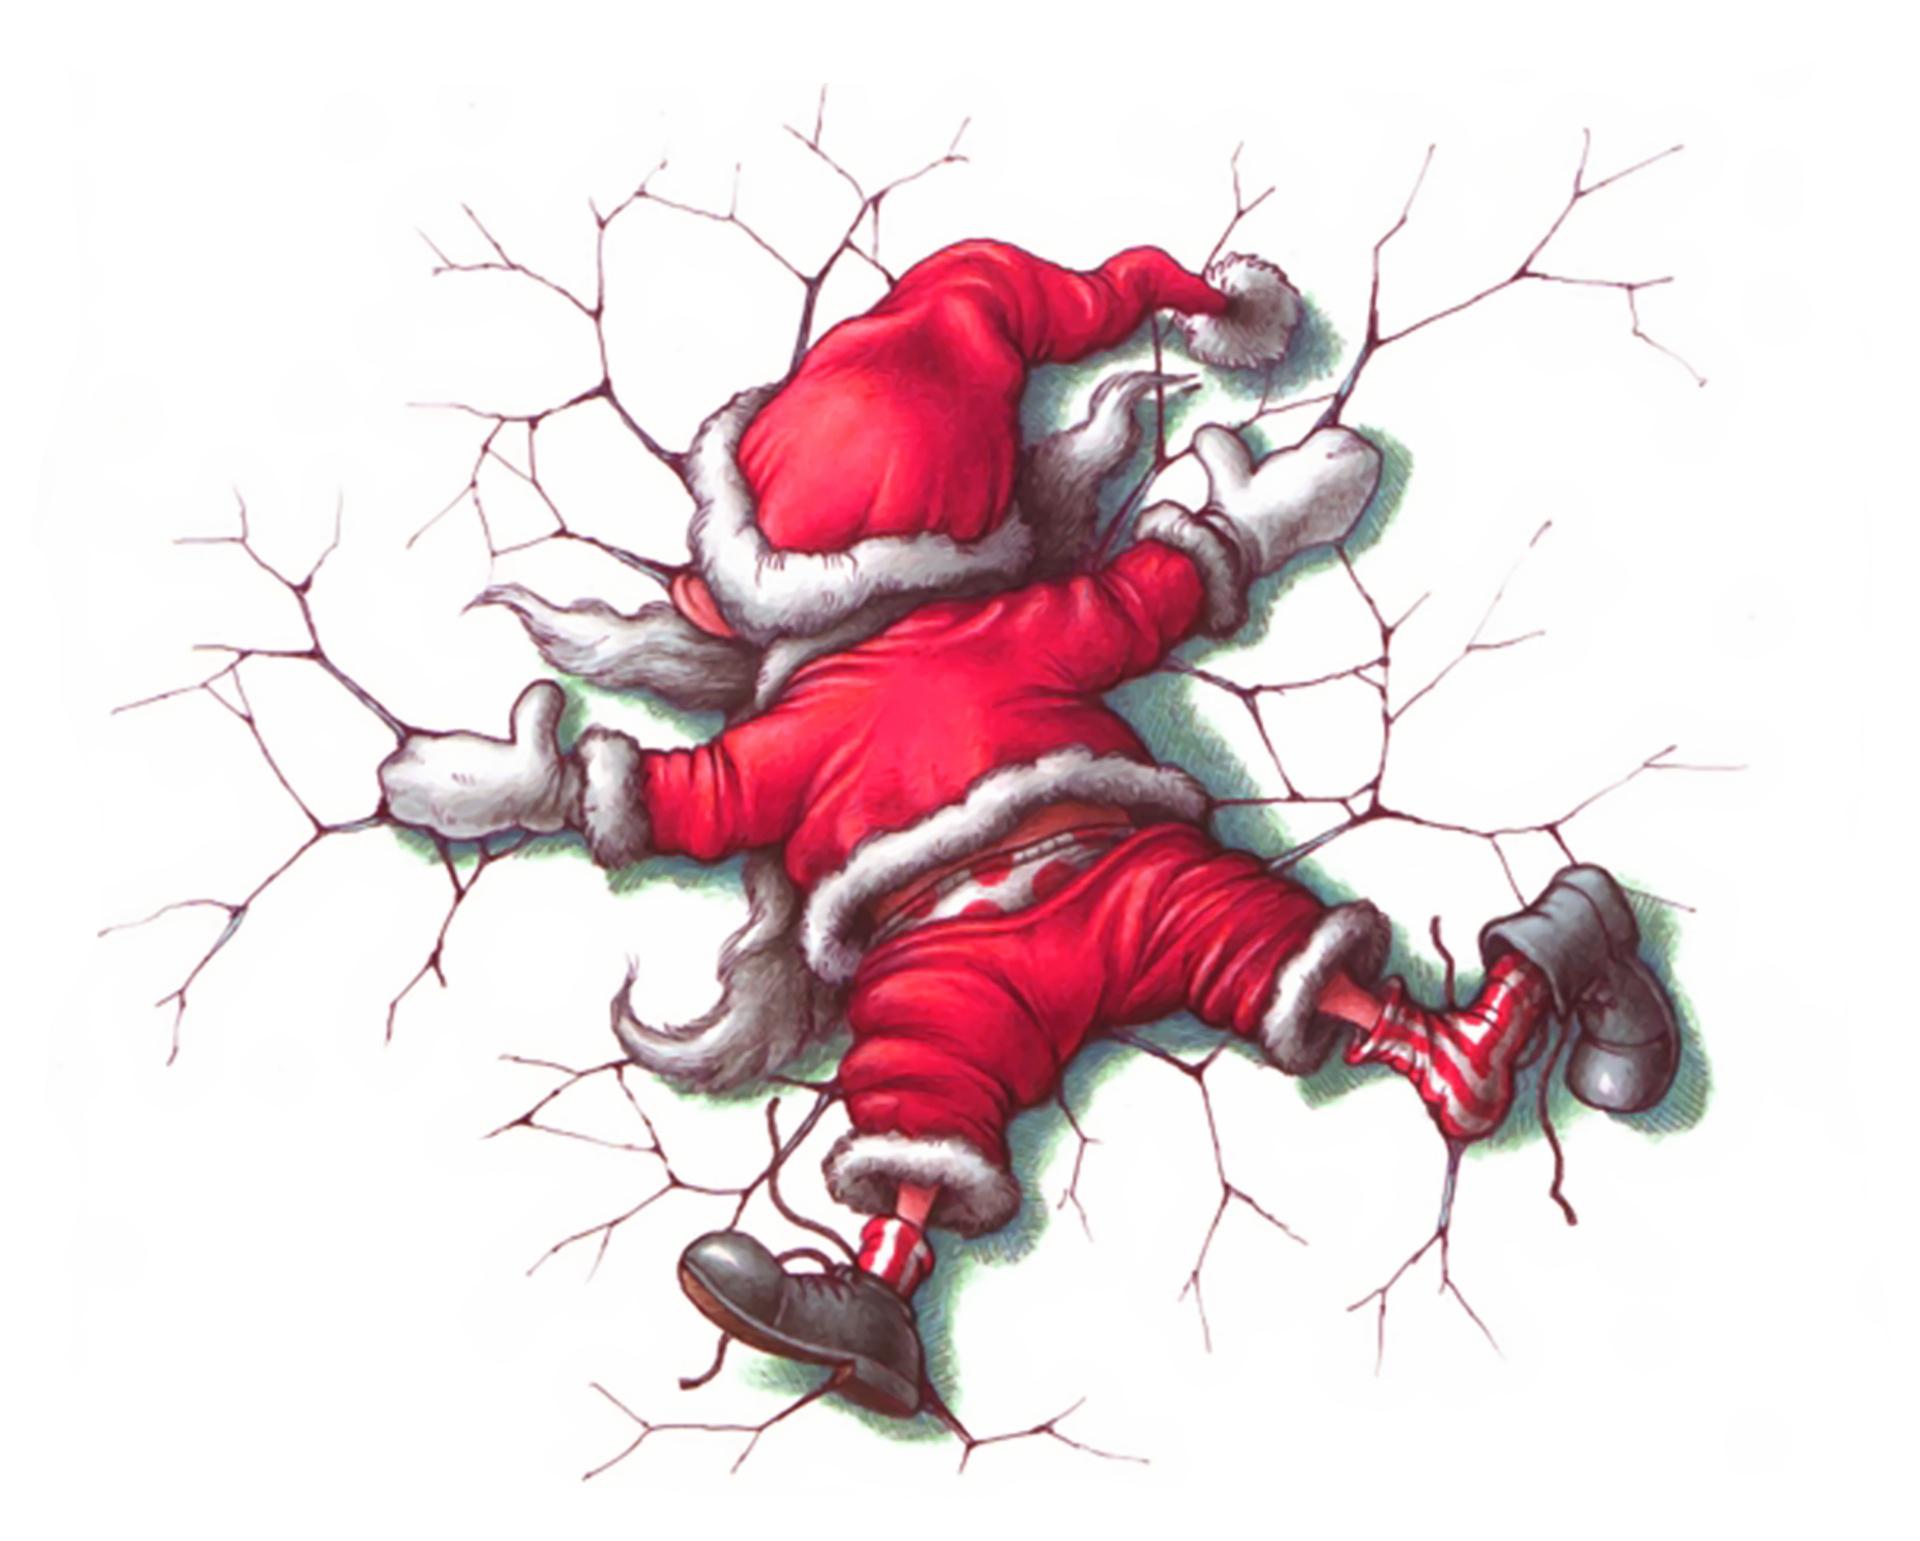 Funny Christmas Cartoon Wallpaper for Desktop   Wallpapers Mela 1920x1541